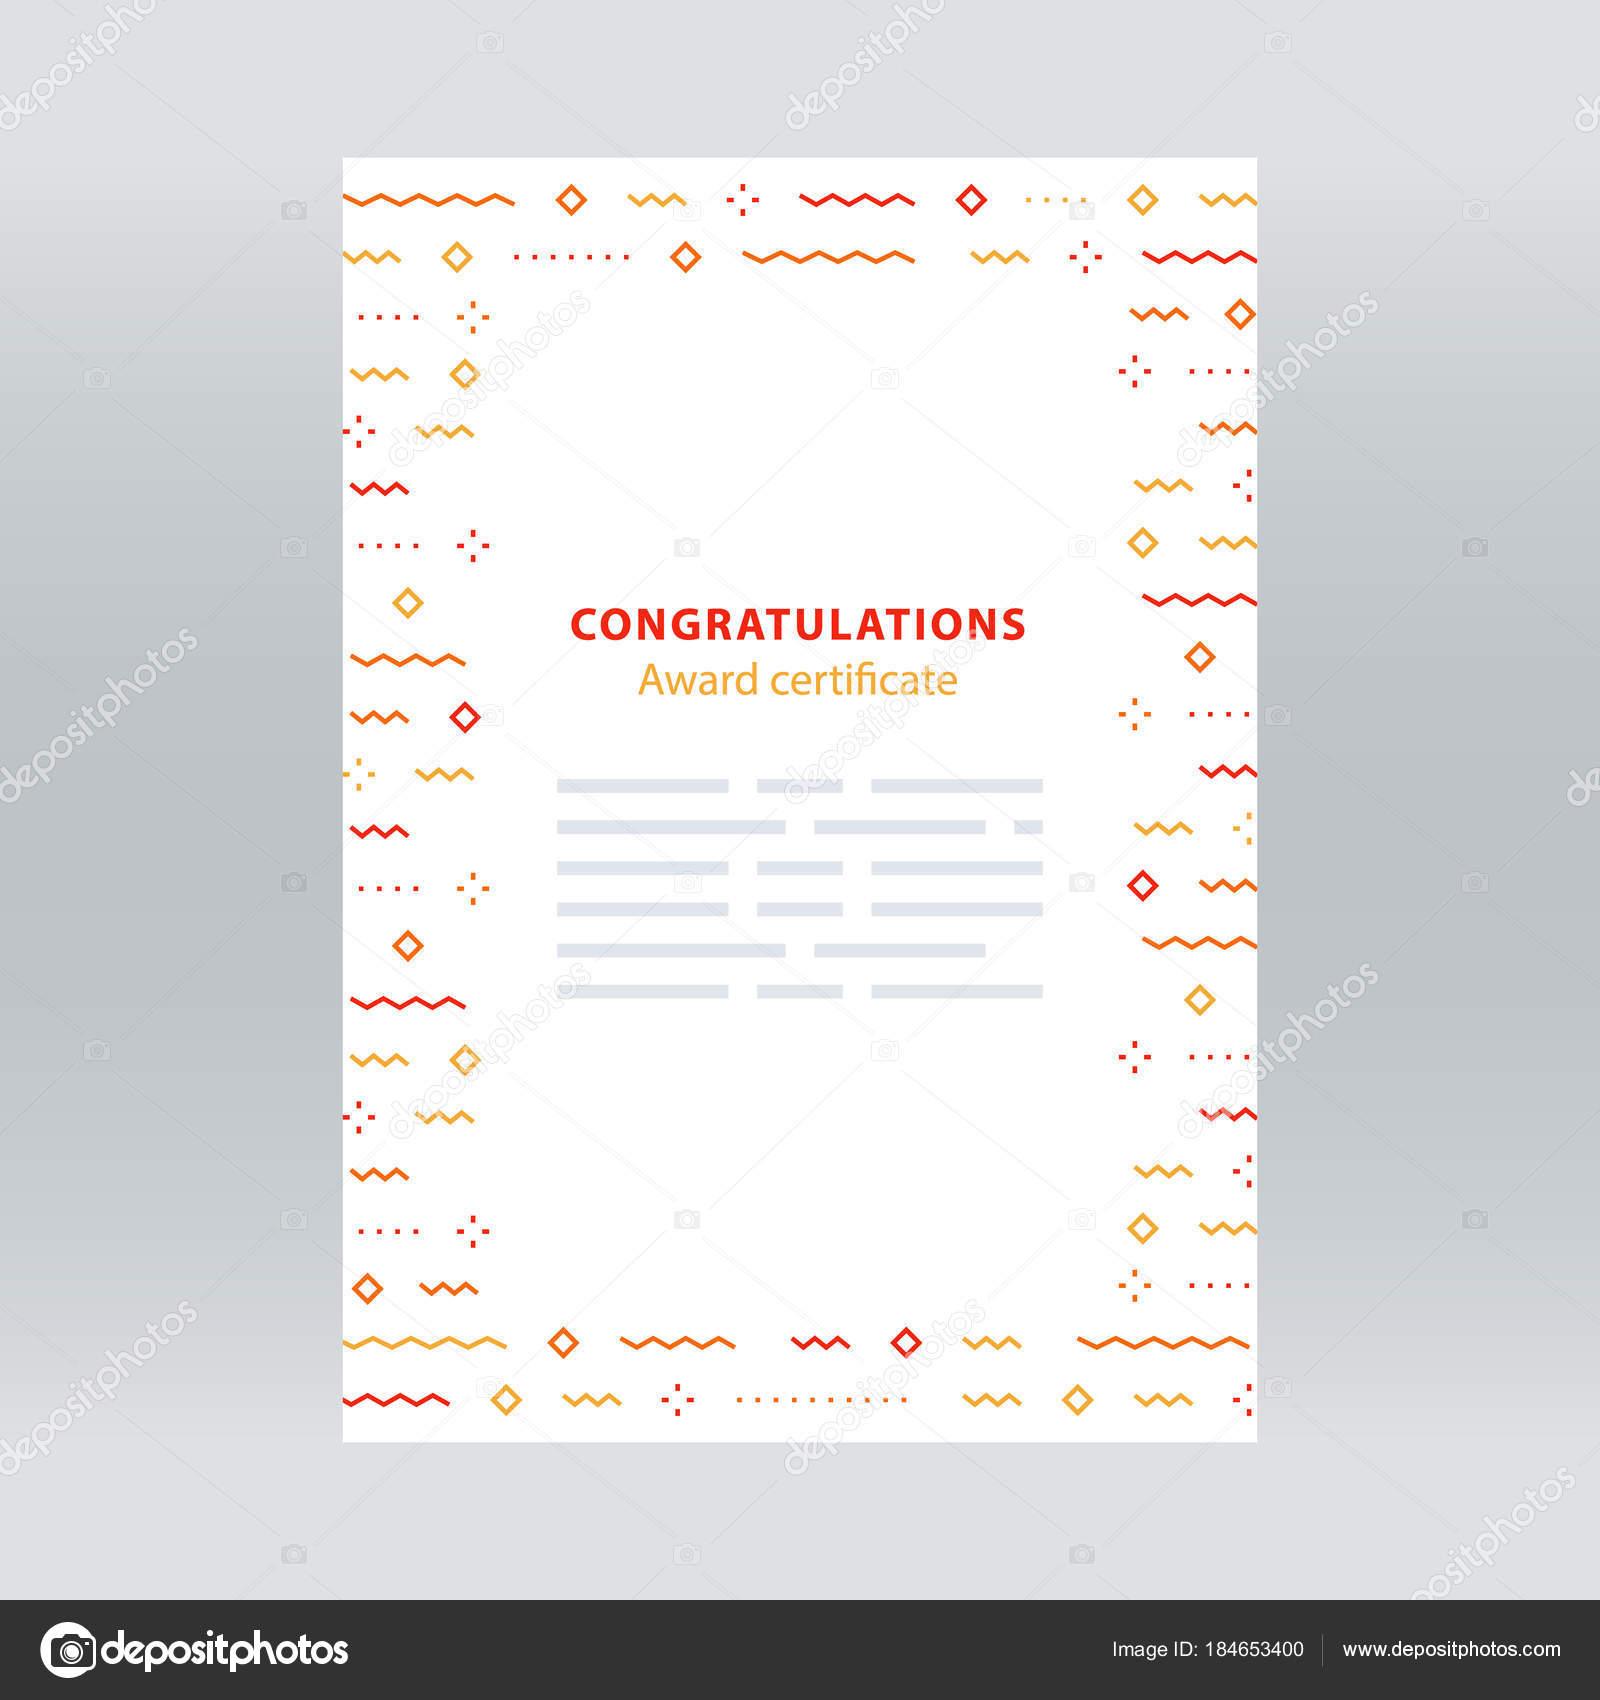 Festive border confetti background vector pattern minimalist award certificate border with falling confetti pattern abstract background minimalist festive decoration celebration backdrop concept vector line stopboris Images